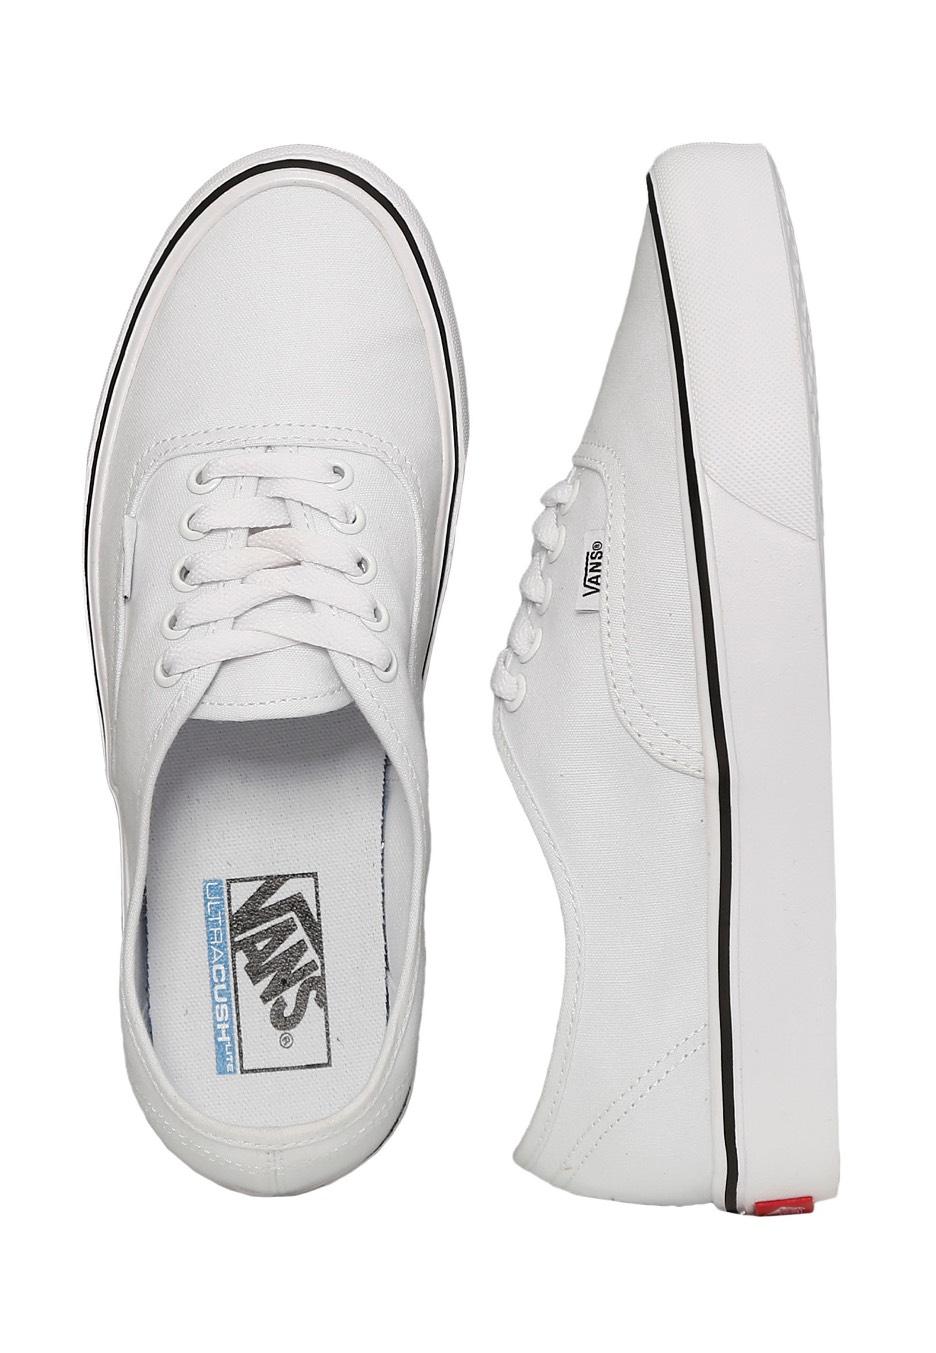 31bbd14e8af1d1 Vans - Authentic Lite Canvas True White - Girl Shoes - Impericon.com  Worldwide